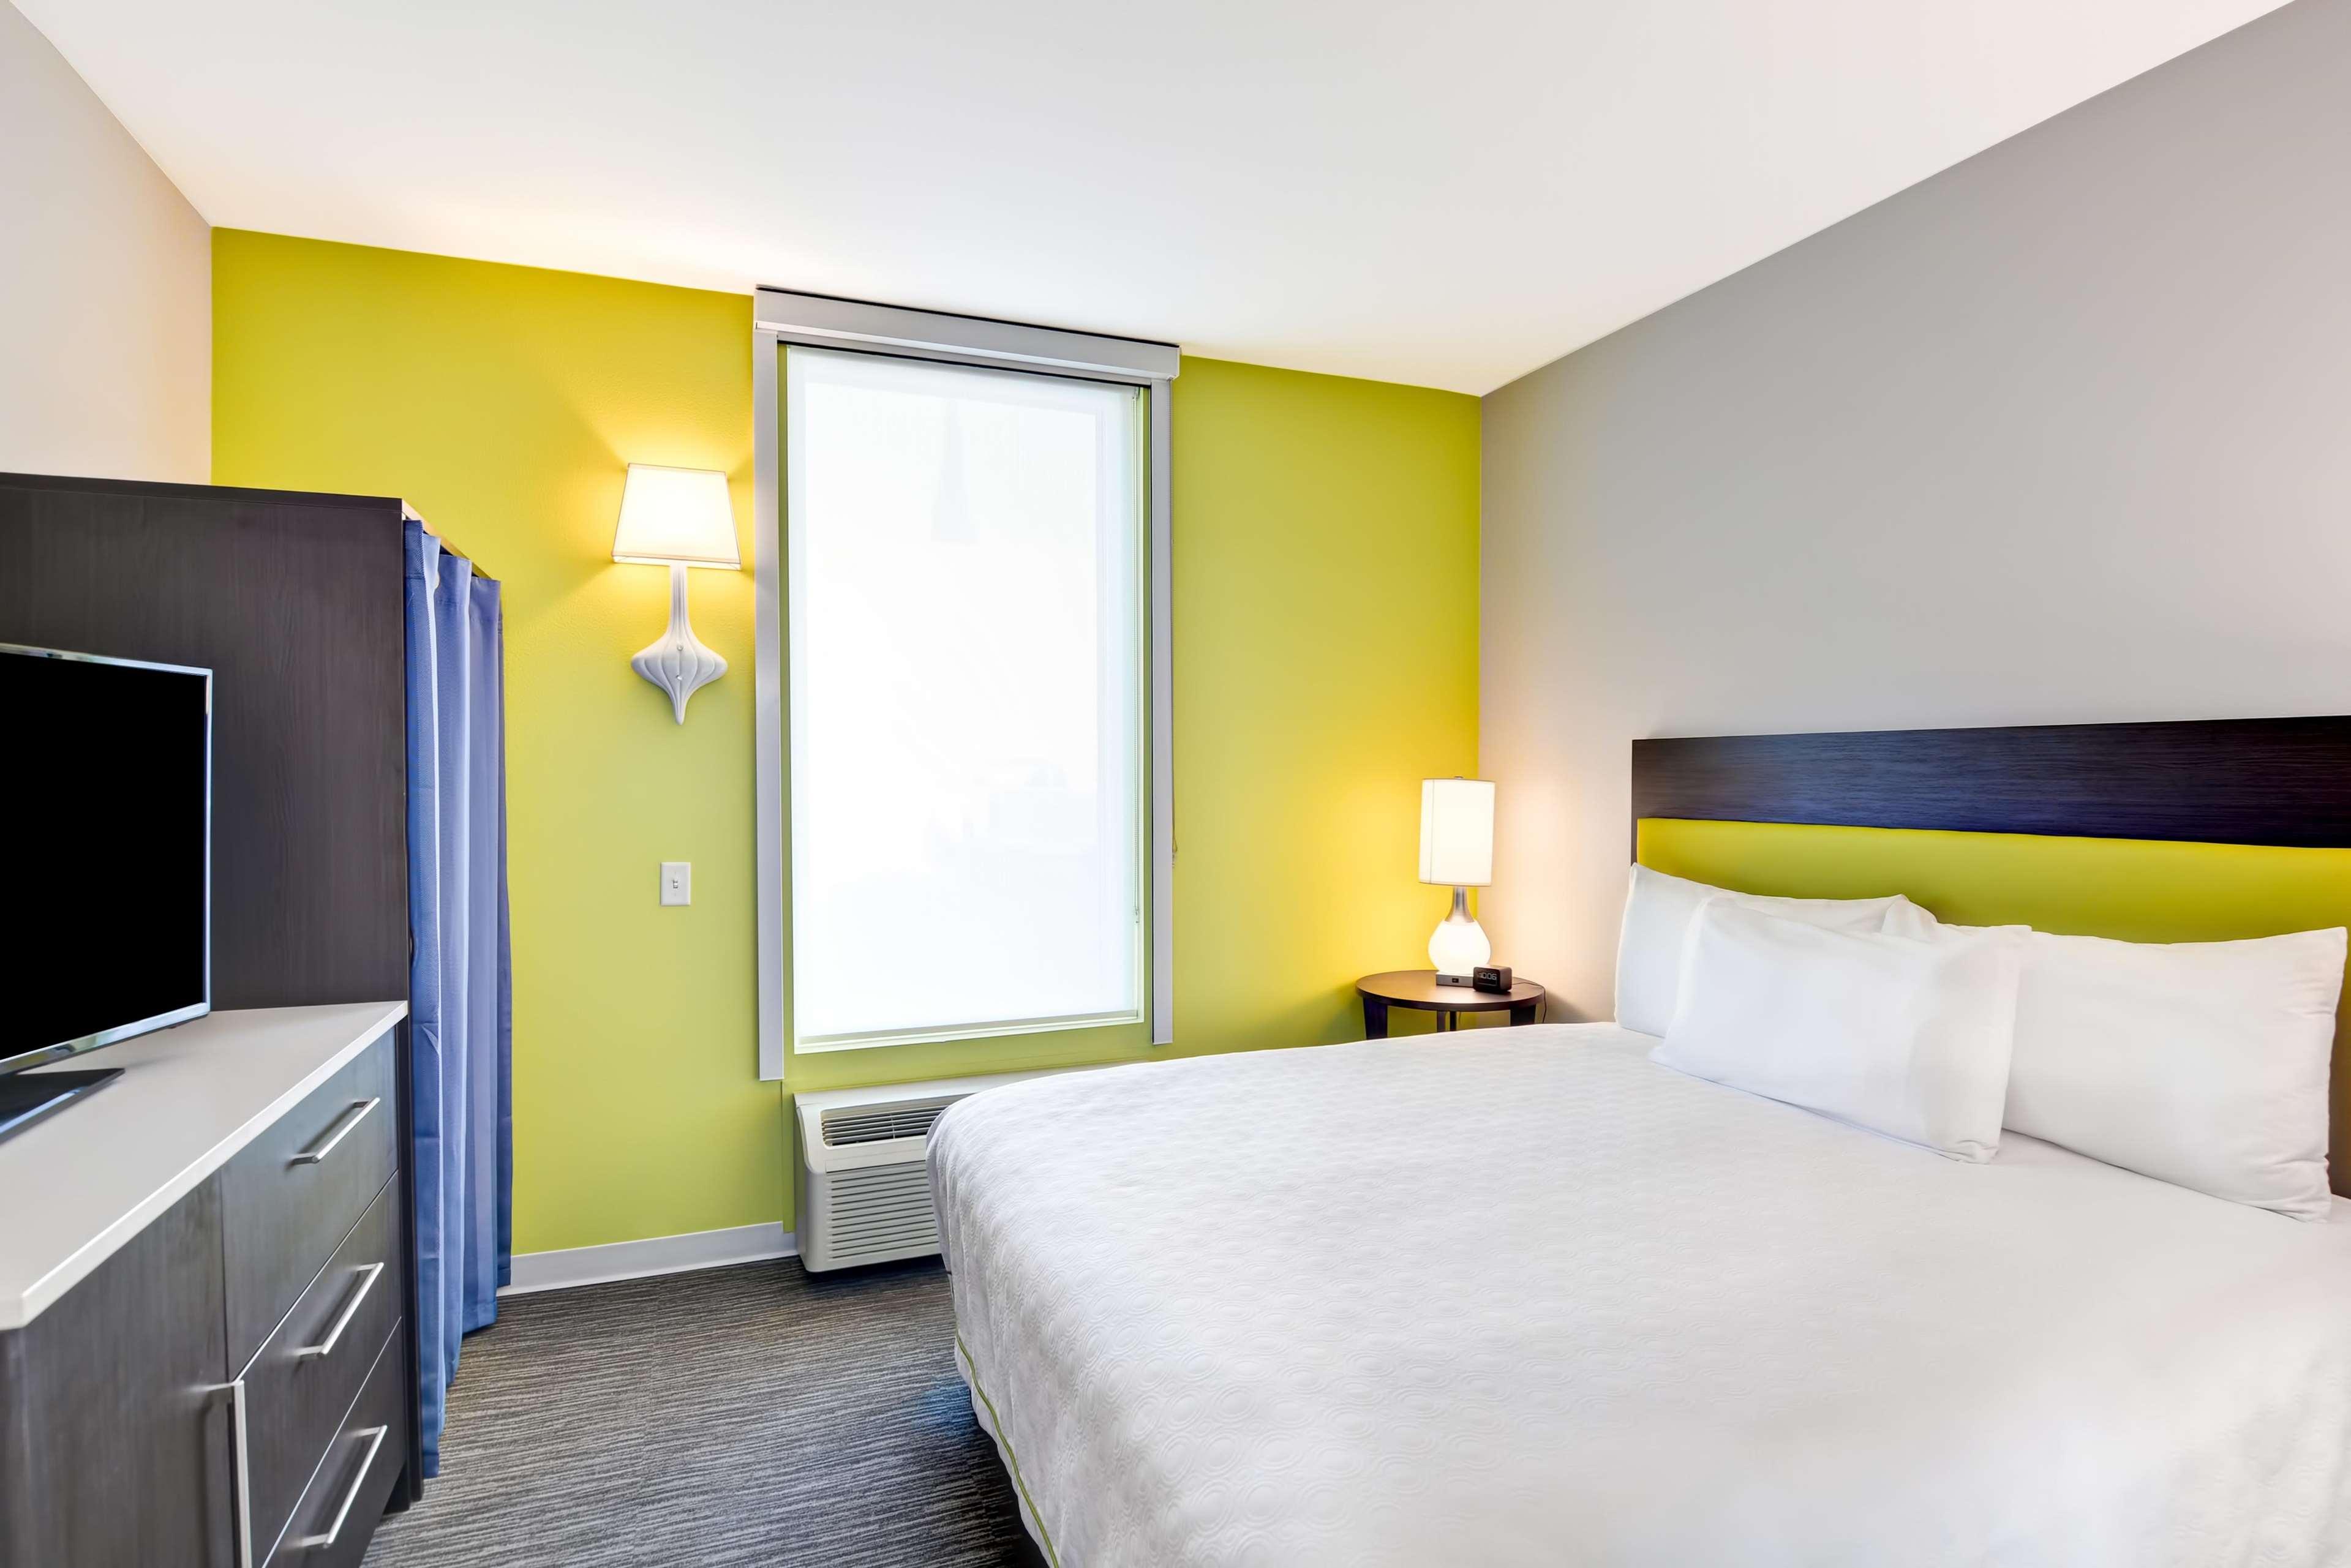 Home2 Suites by Hilton Azusa image 15